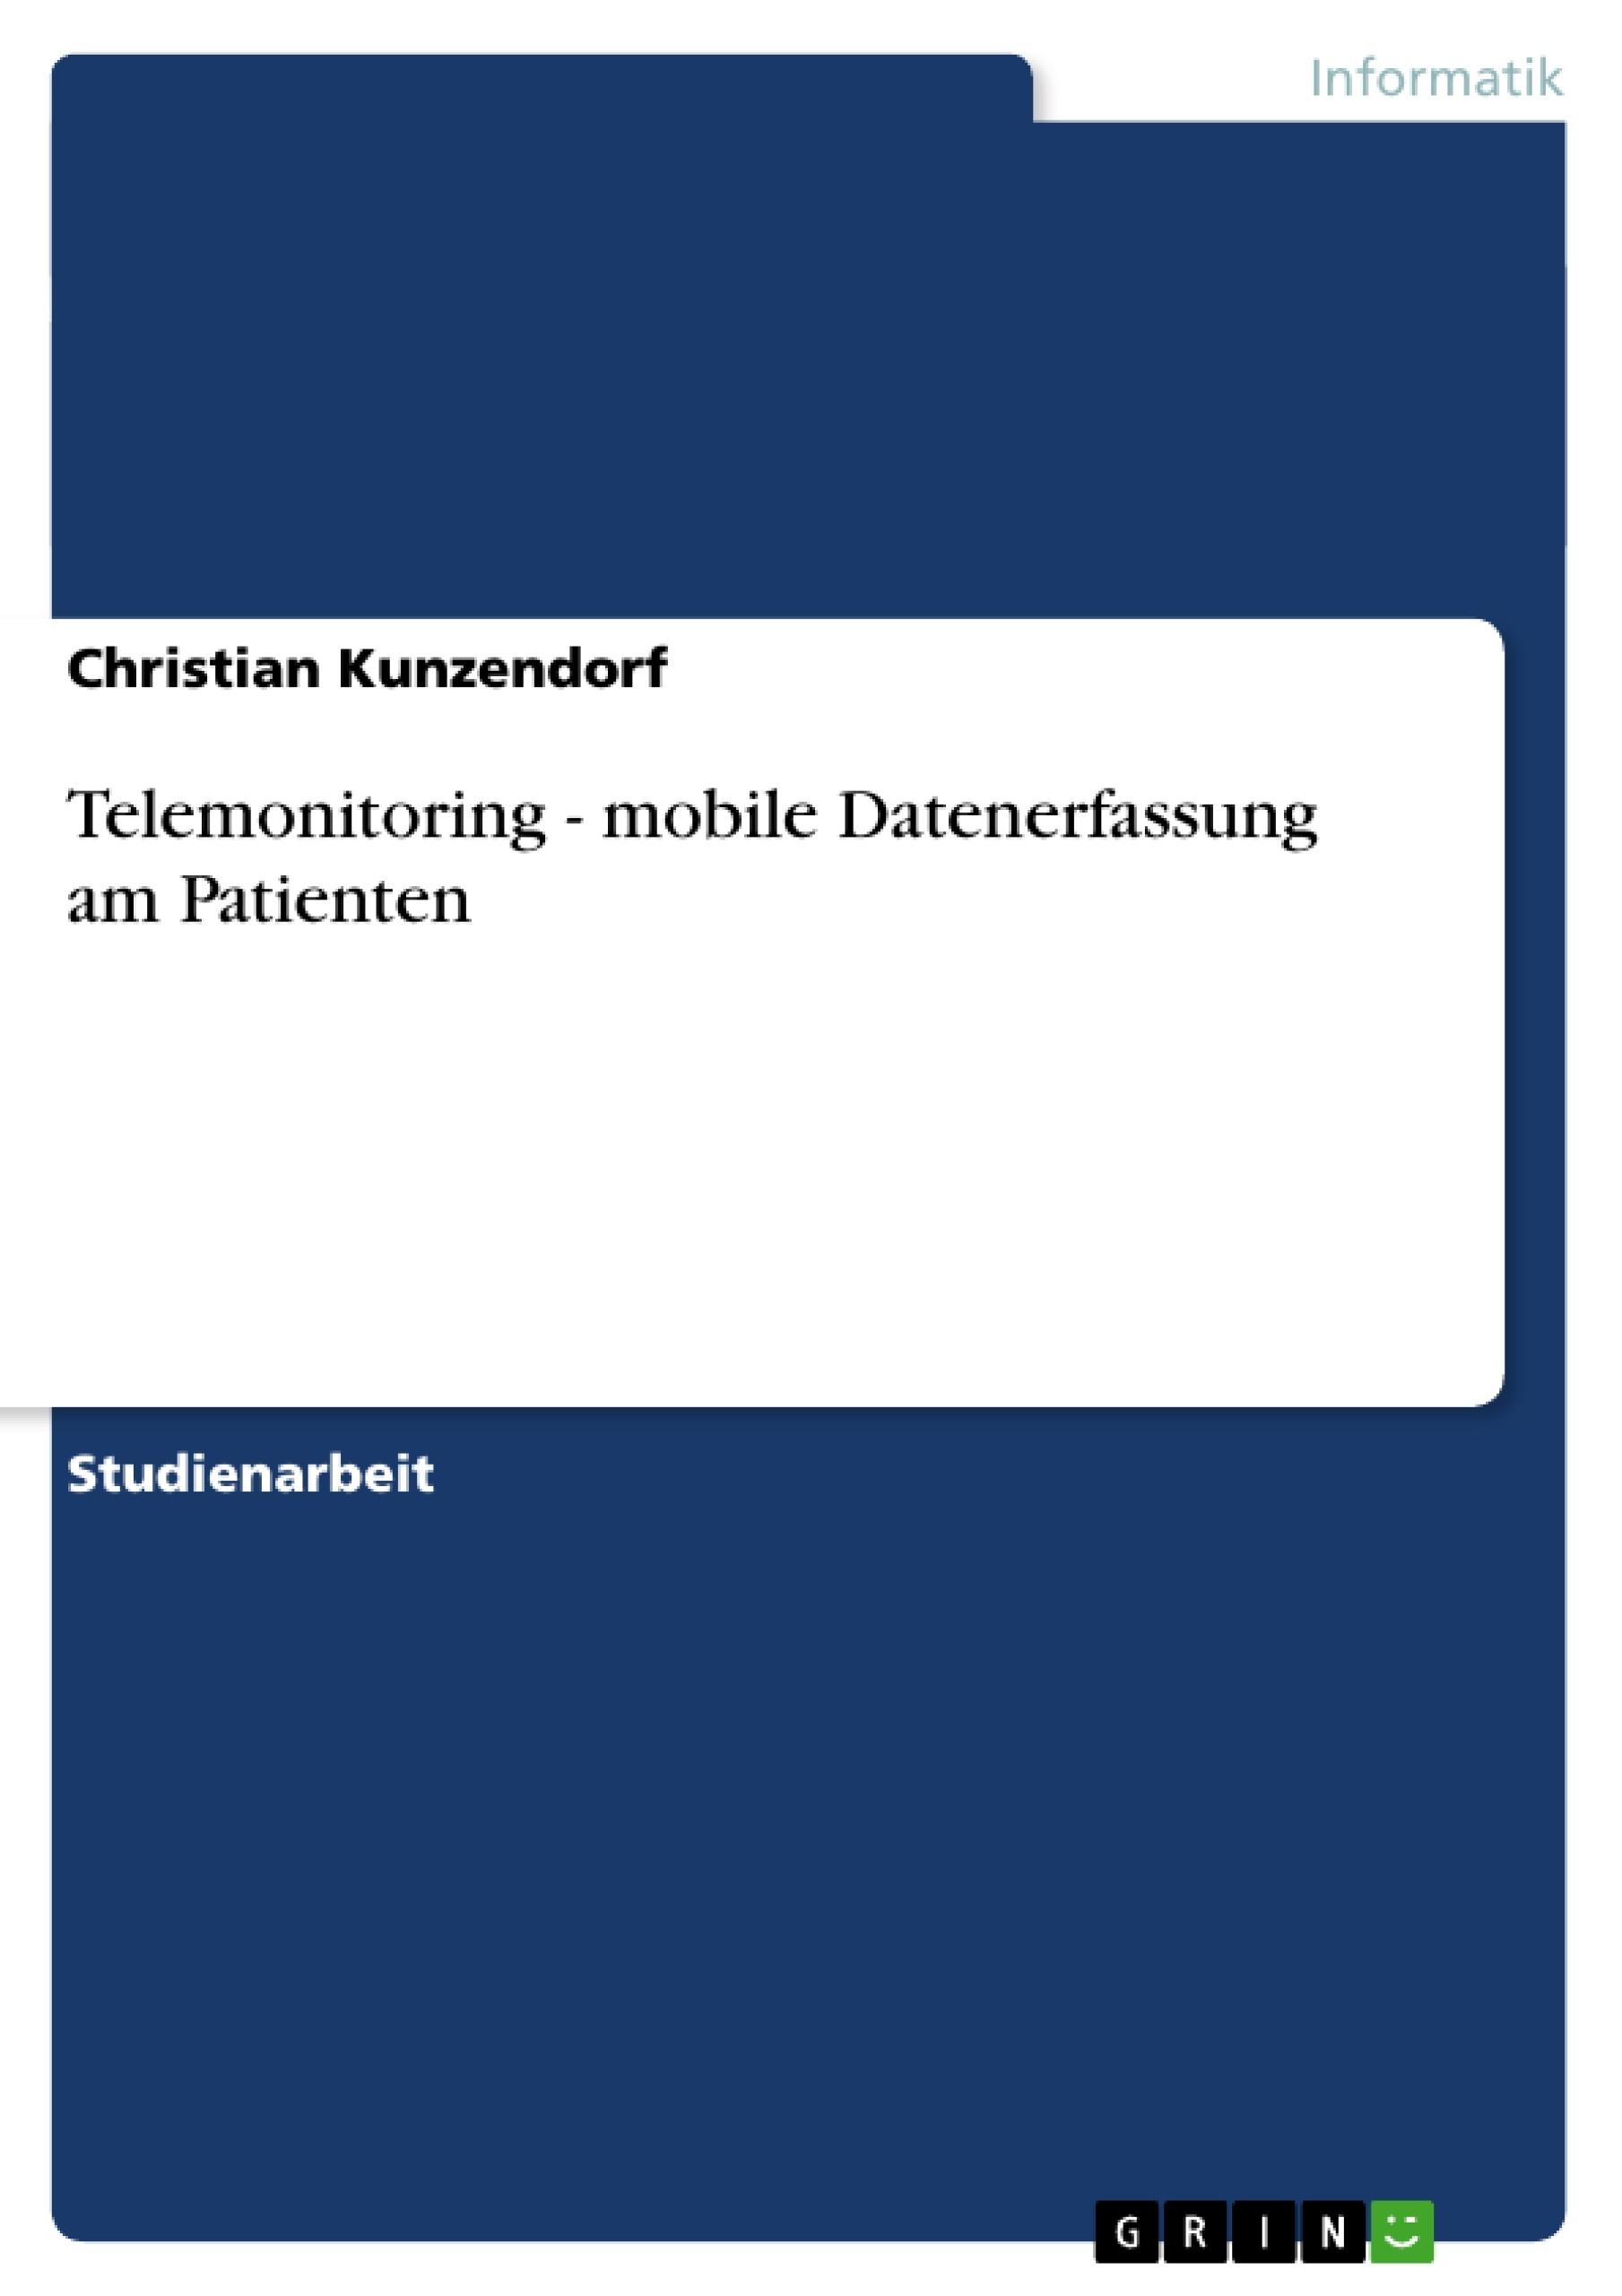 Titel: Telemonitoring - mobile Datenerfassung am Patienten